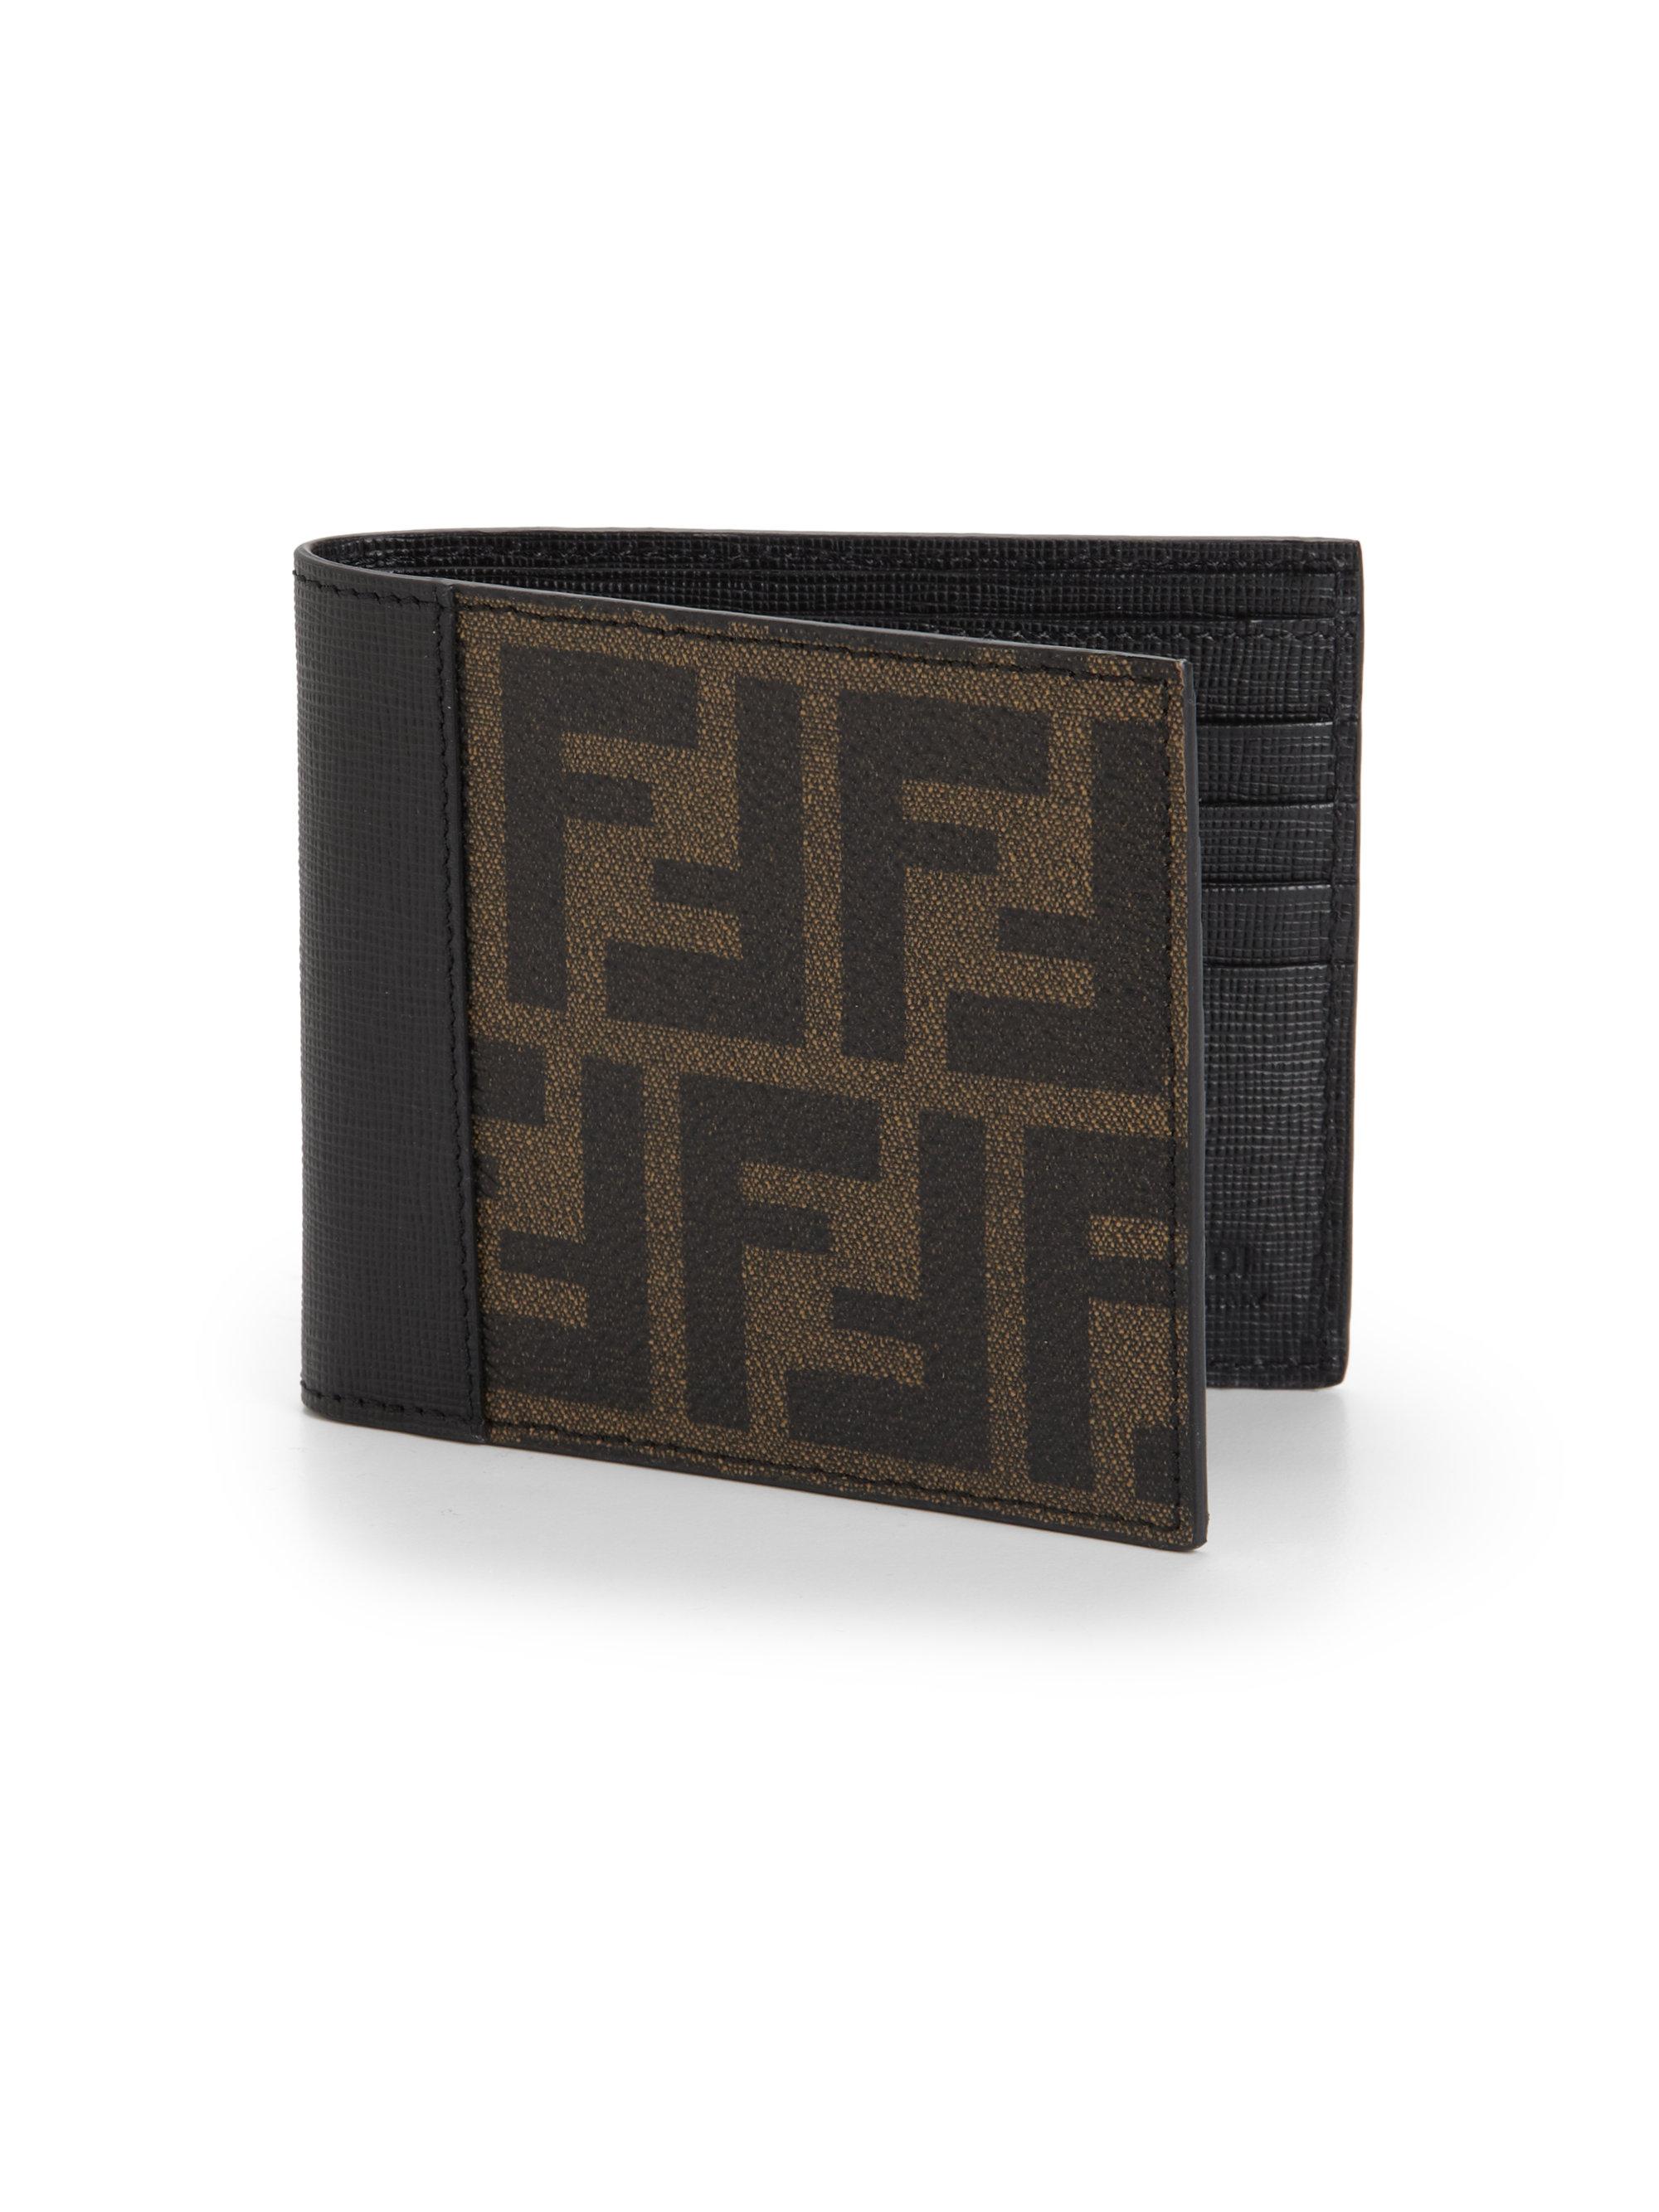 Fendi Zucca Leather Wallet In Brown For Men Lyst